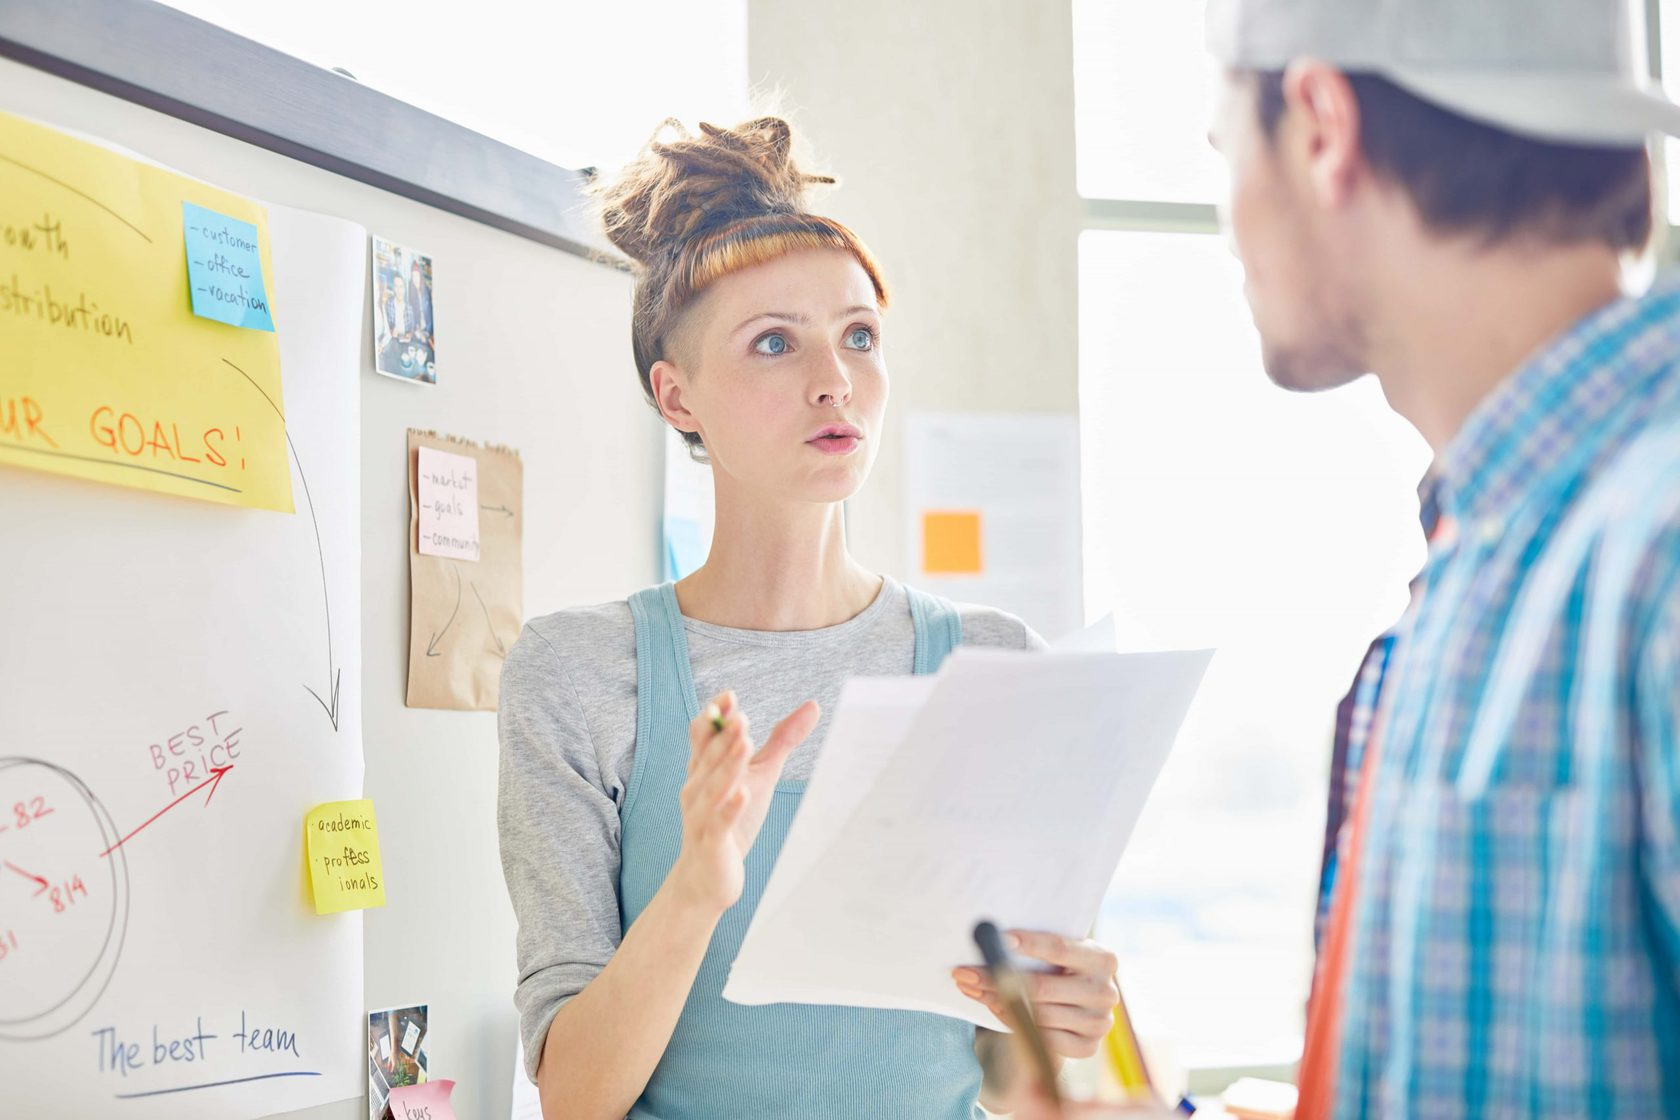 Что должен знать и уметь мессенджер-маркетолог